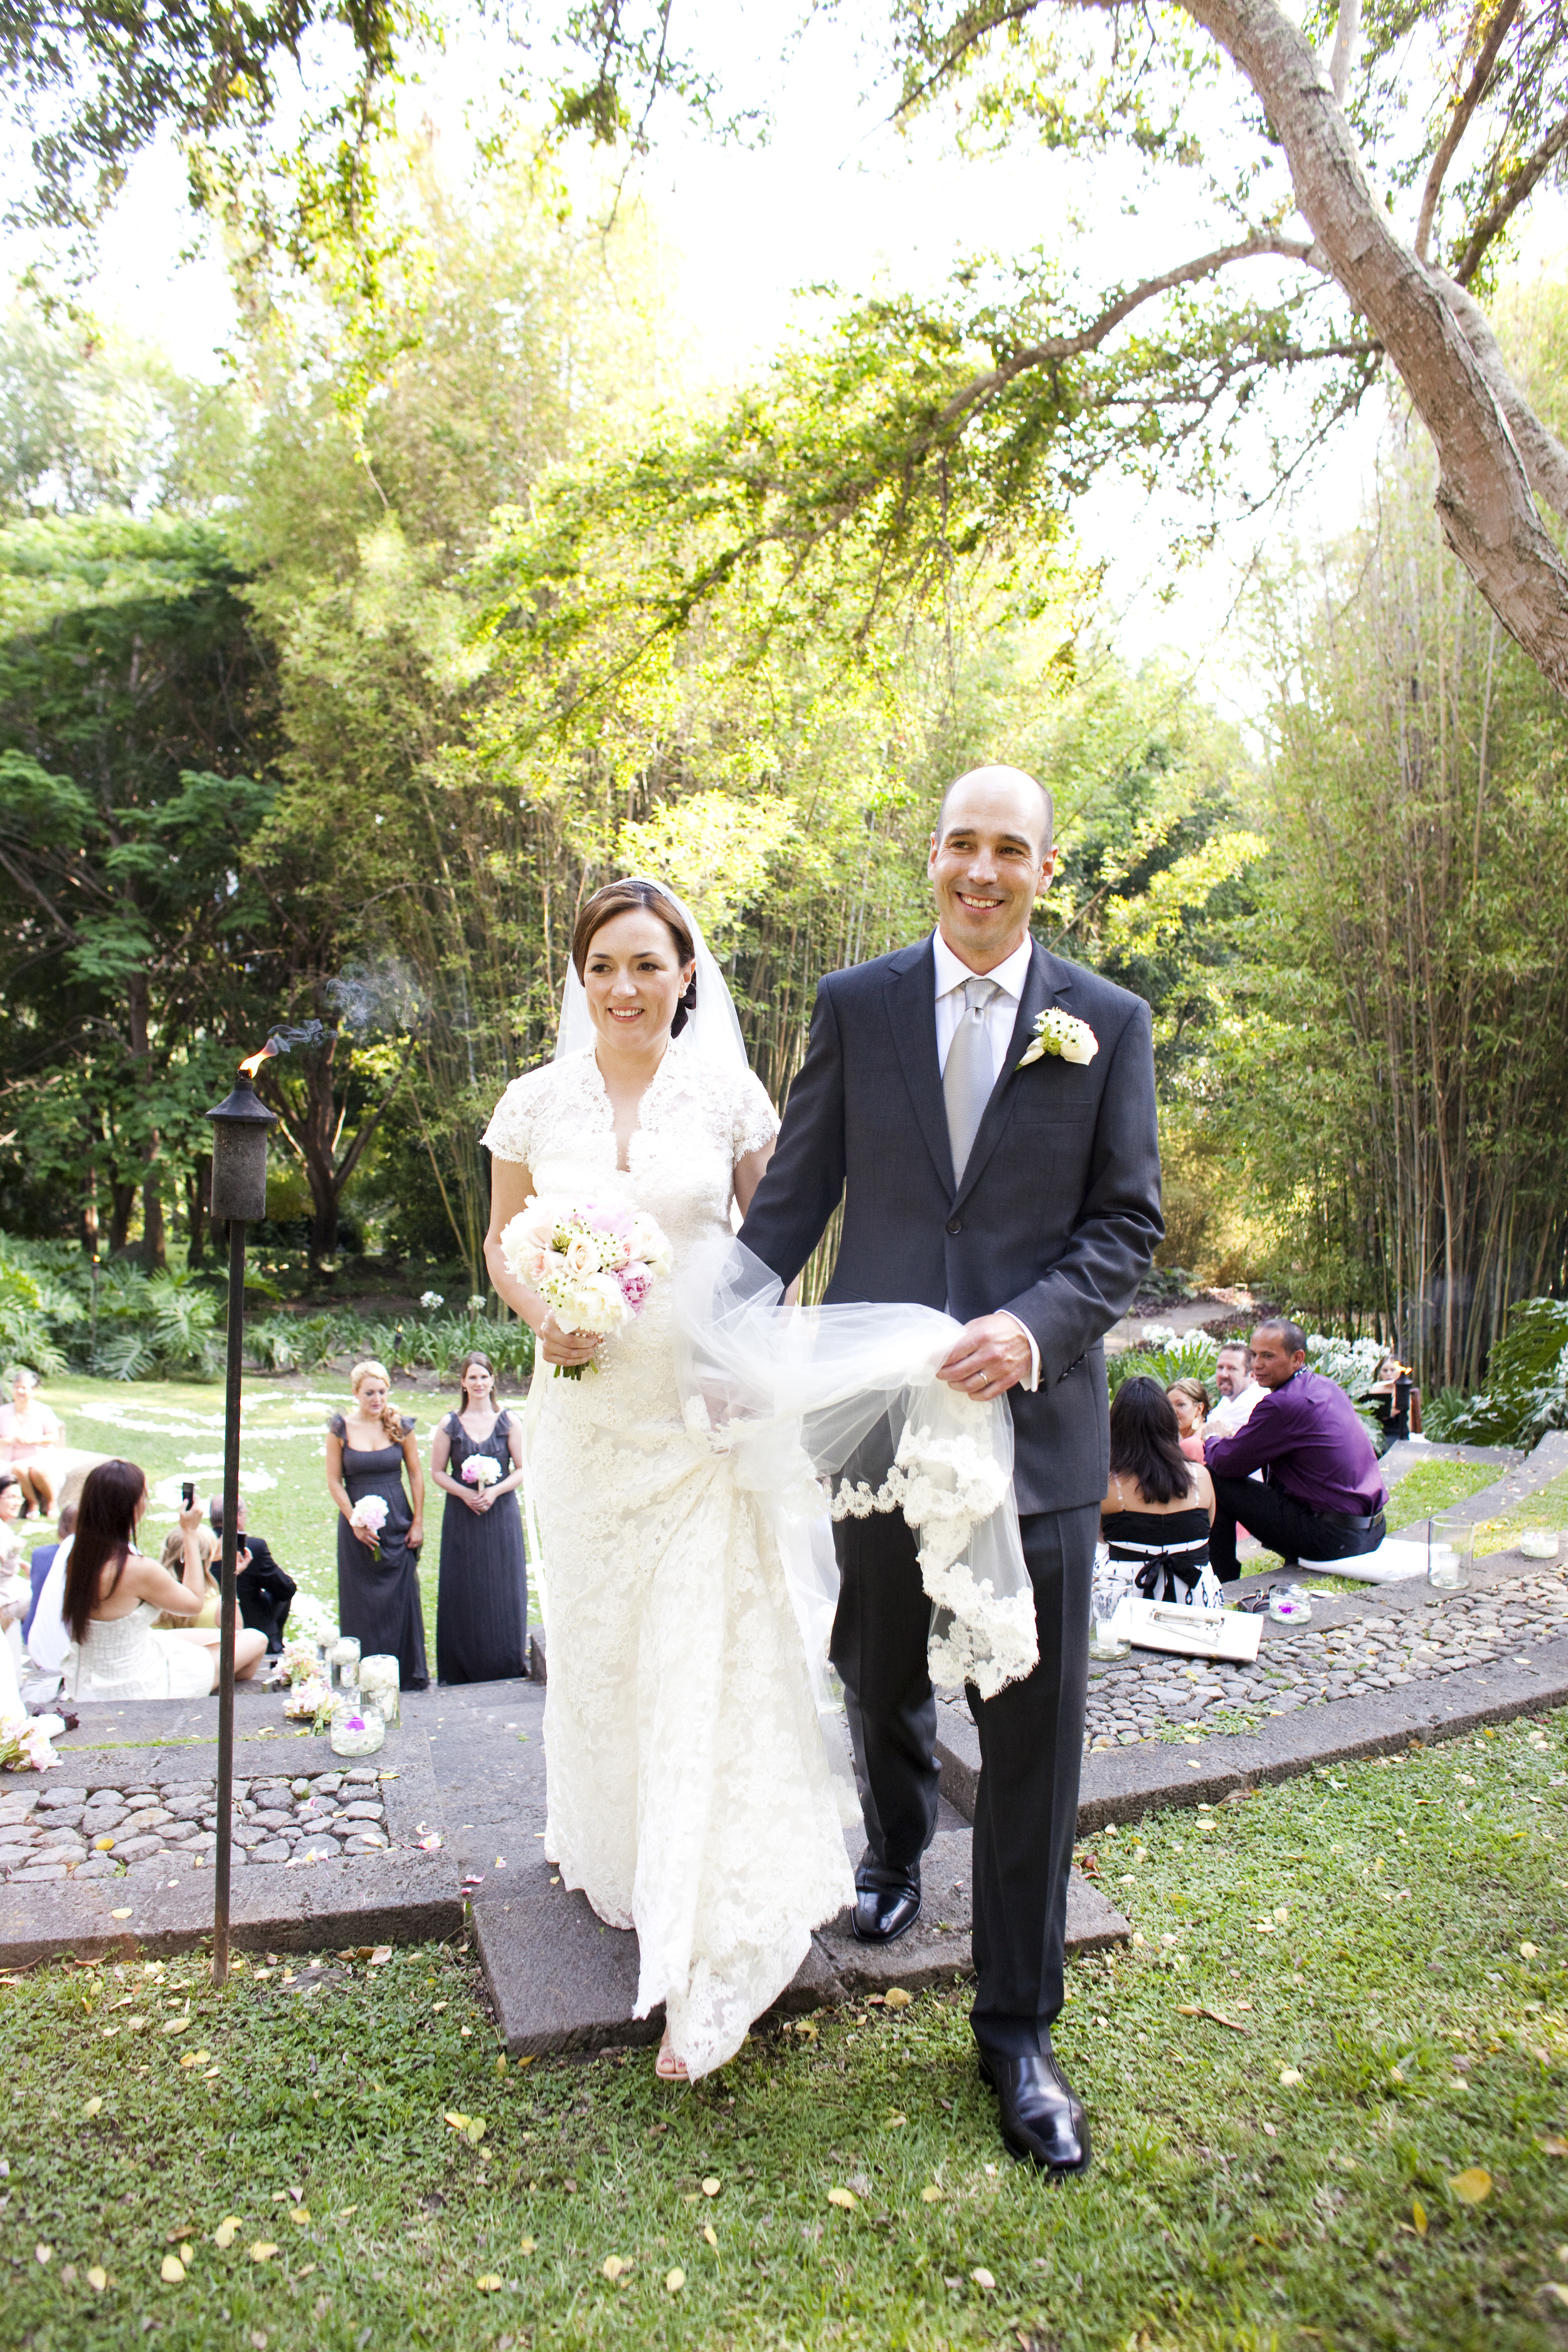 Ceci_New_York_Style_Luxury_Custom_Mexico_Wedding_CeciBride_Letterpress_NewYork_Foil_Hacienda_de_San_Antonio_25.jpg